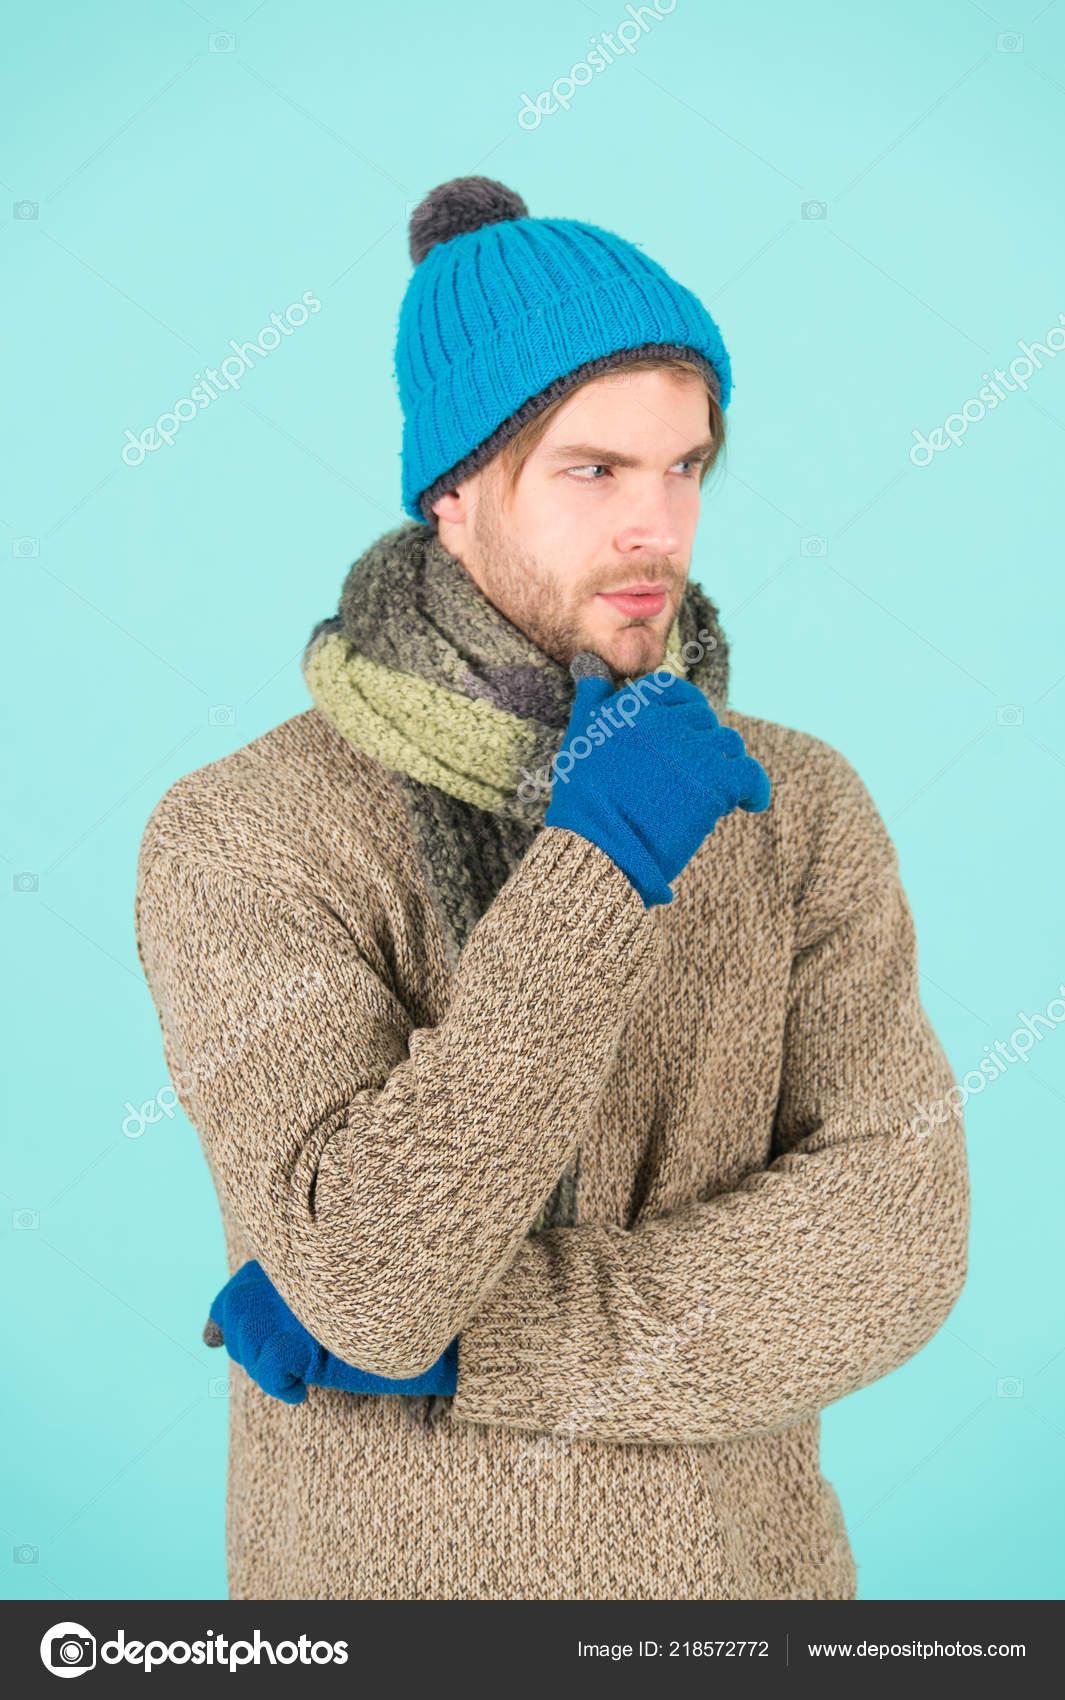 bc2eb1bb430 Χειμερινή μόδα, πλεκτά ενδύματα. Ο άνθρωπος, πλεκτό καπέλο γάντια και  κασκόλ χειμερινή μόδα. Φθορά άνθρωπος πλεκτά αξεσουάρ φόντο τιρκουάζ.  Χειμερινά ...